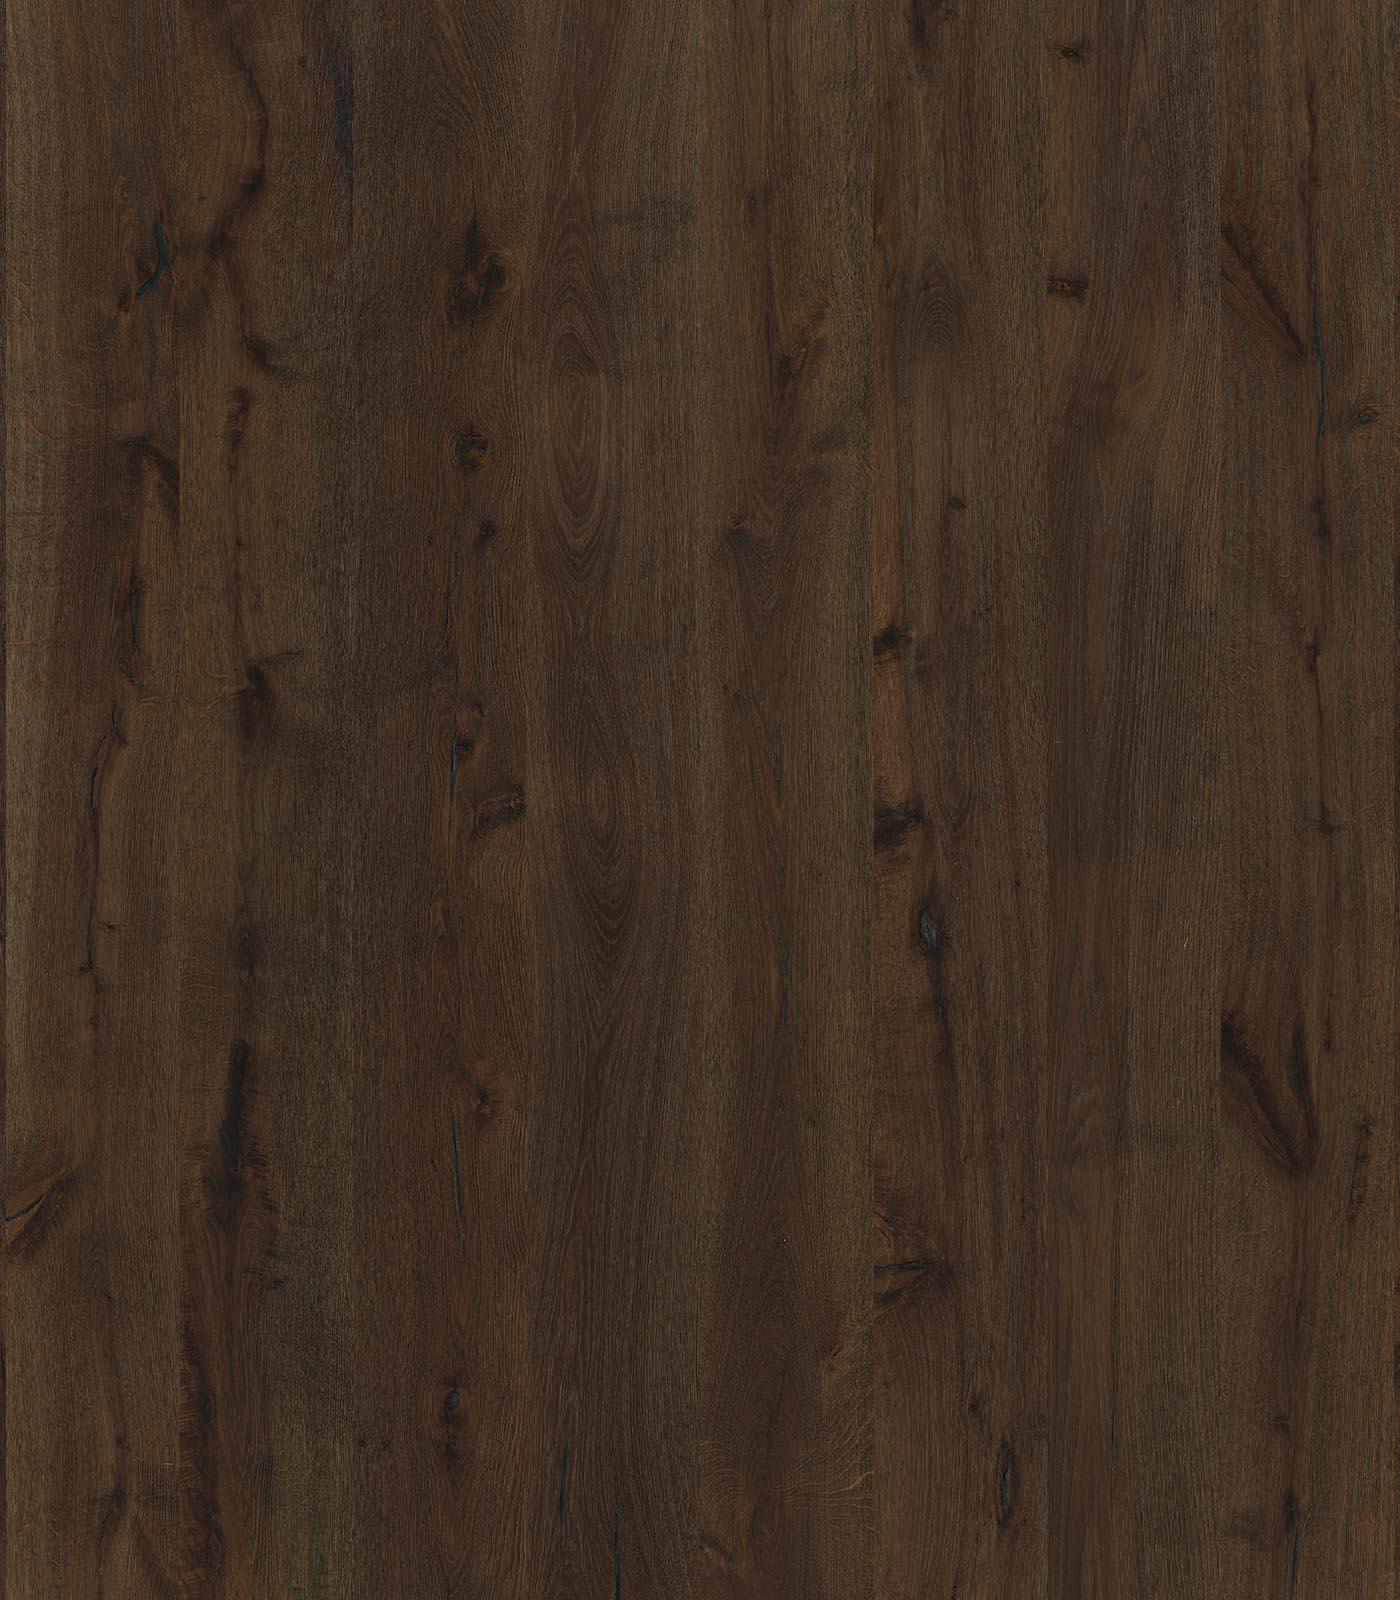 Azores-Variante Collection-European Oak floors - flat